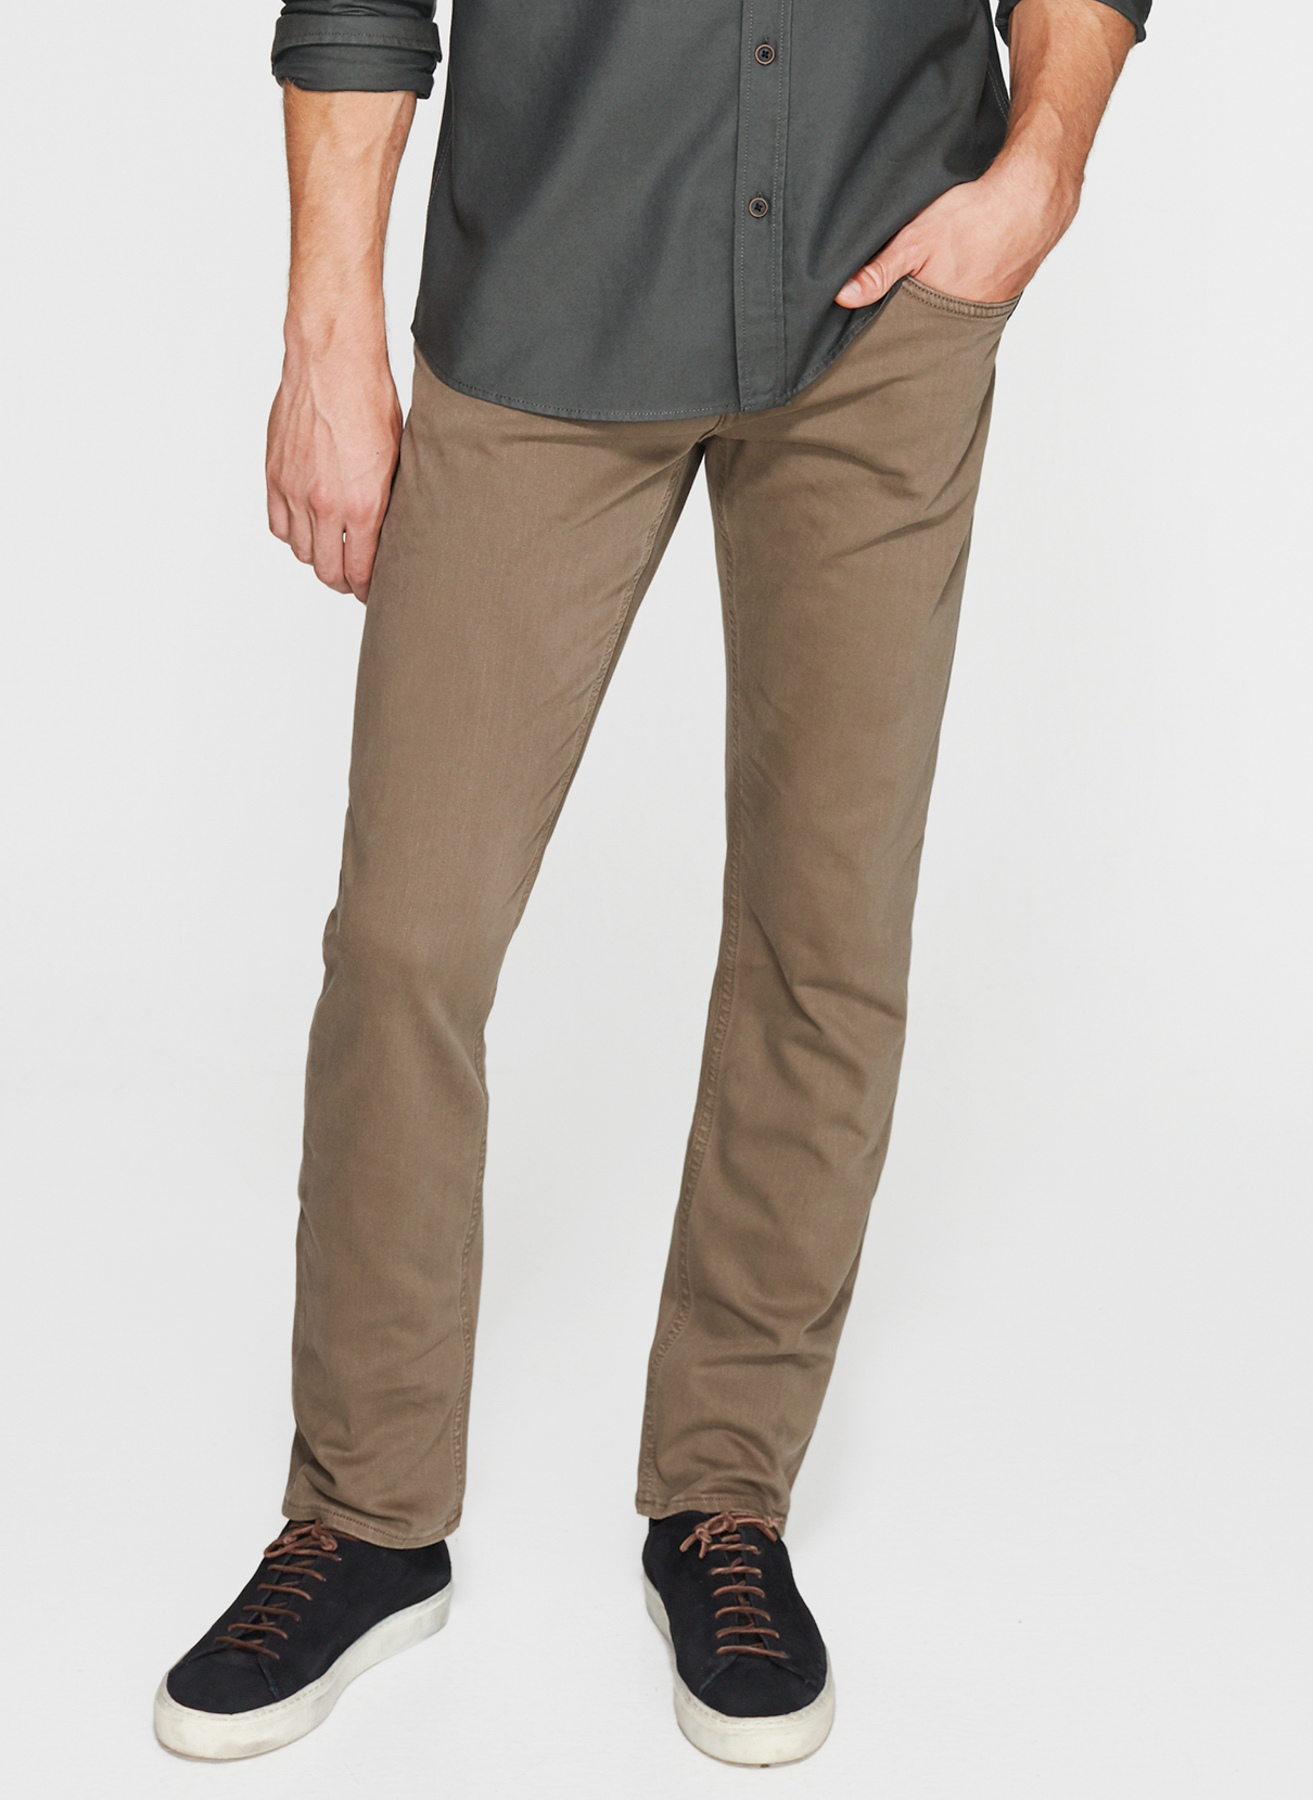 Mavi Klasik Pantolon 31-30 5001634326017 Ürün Resmi